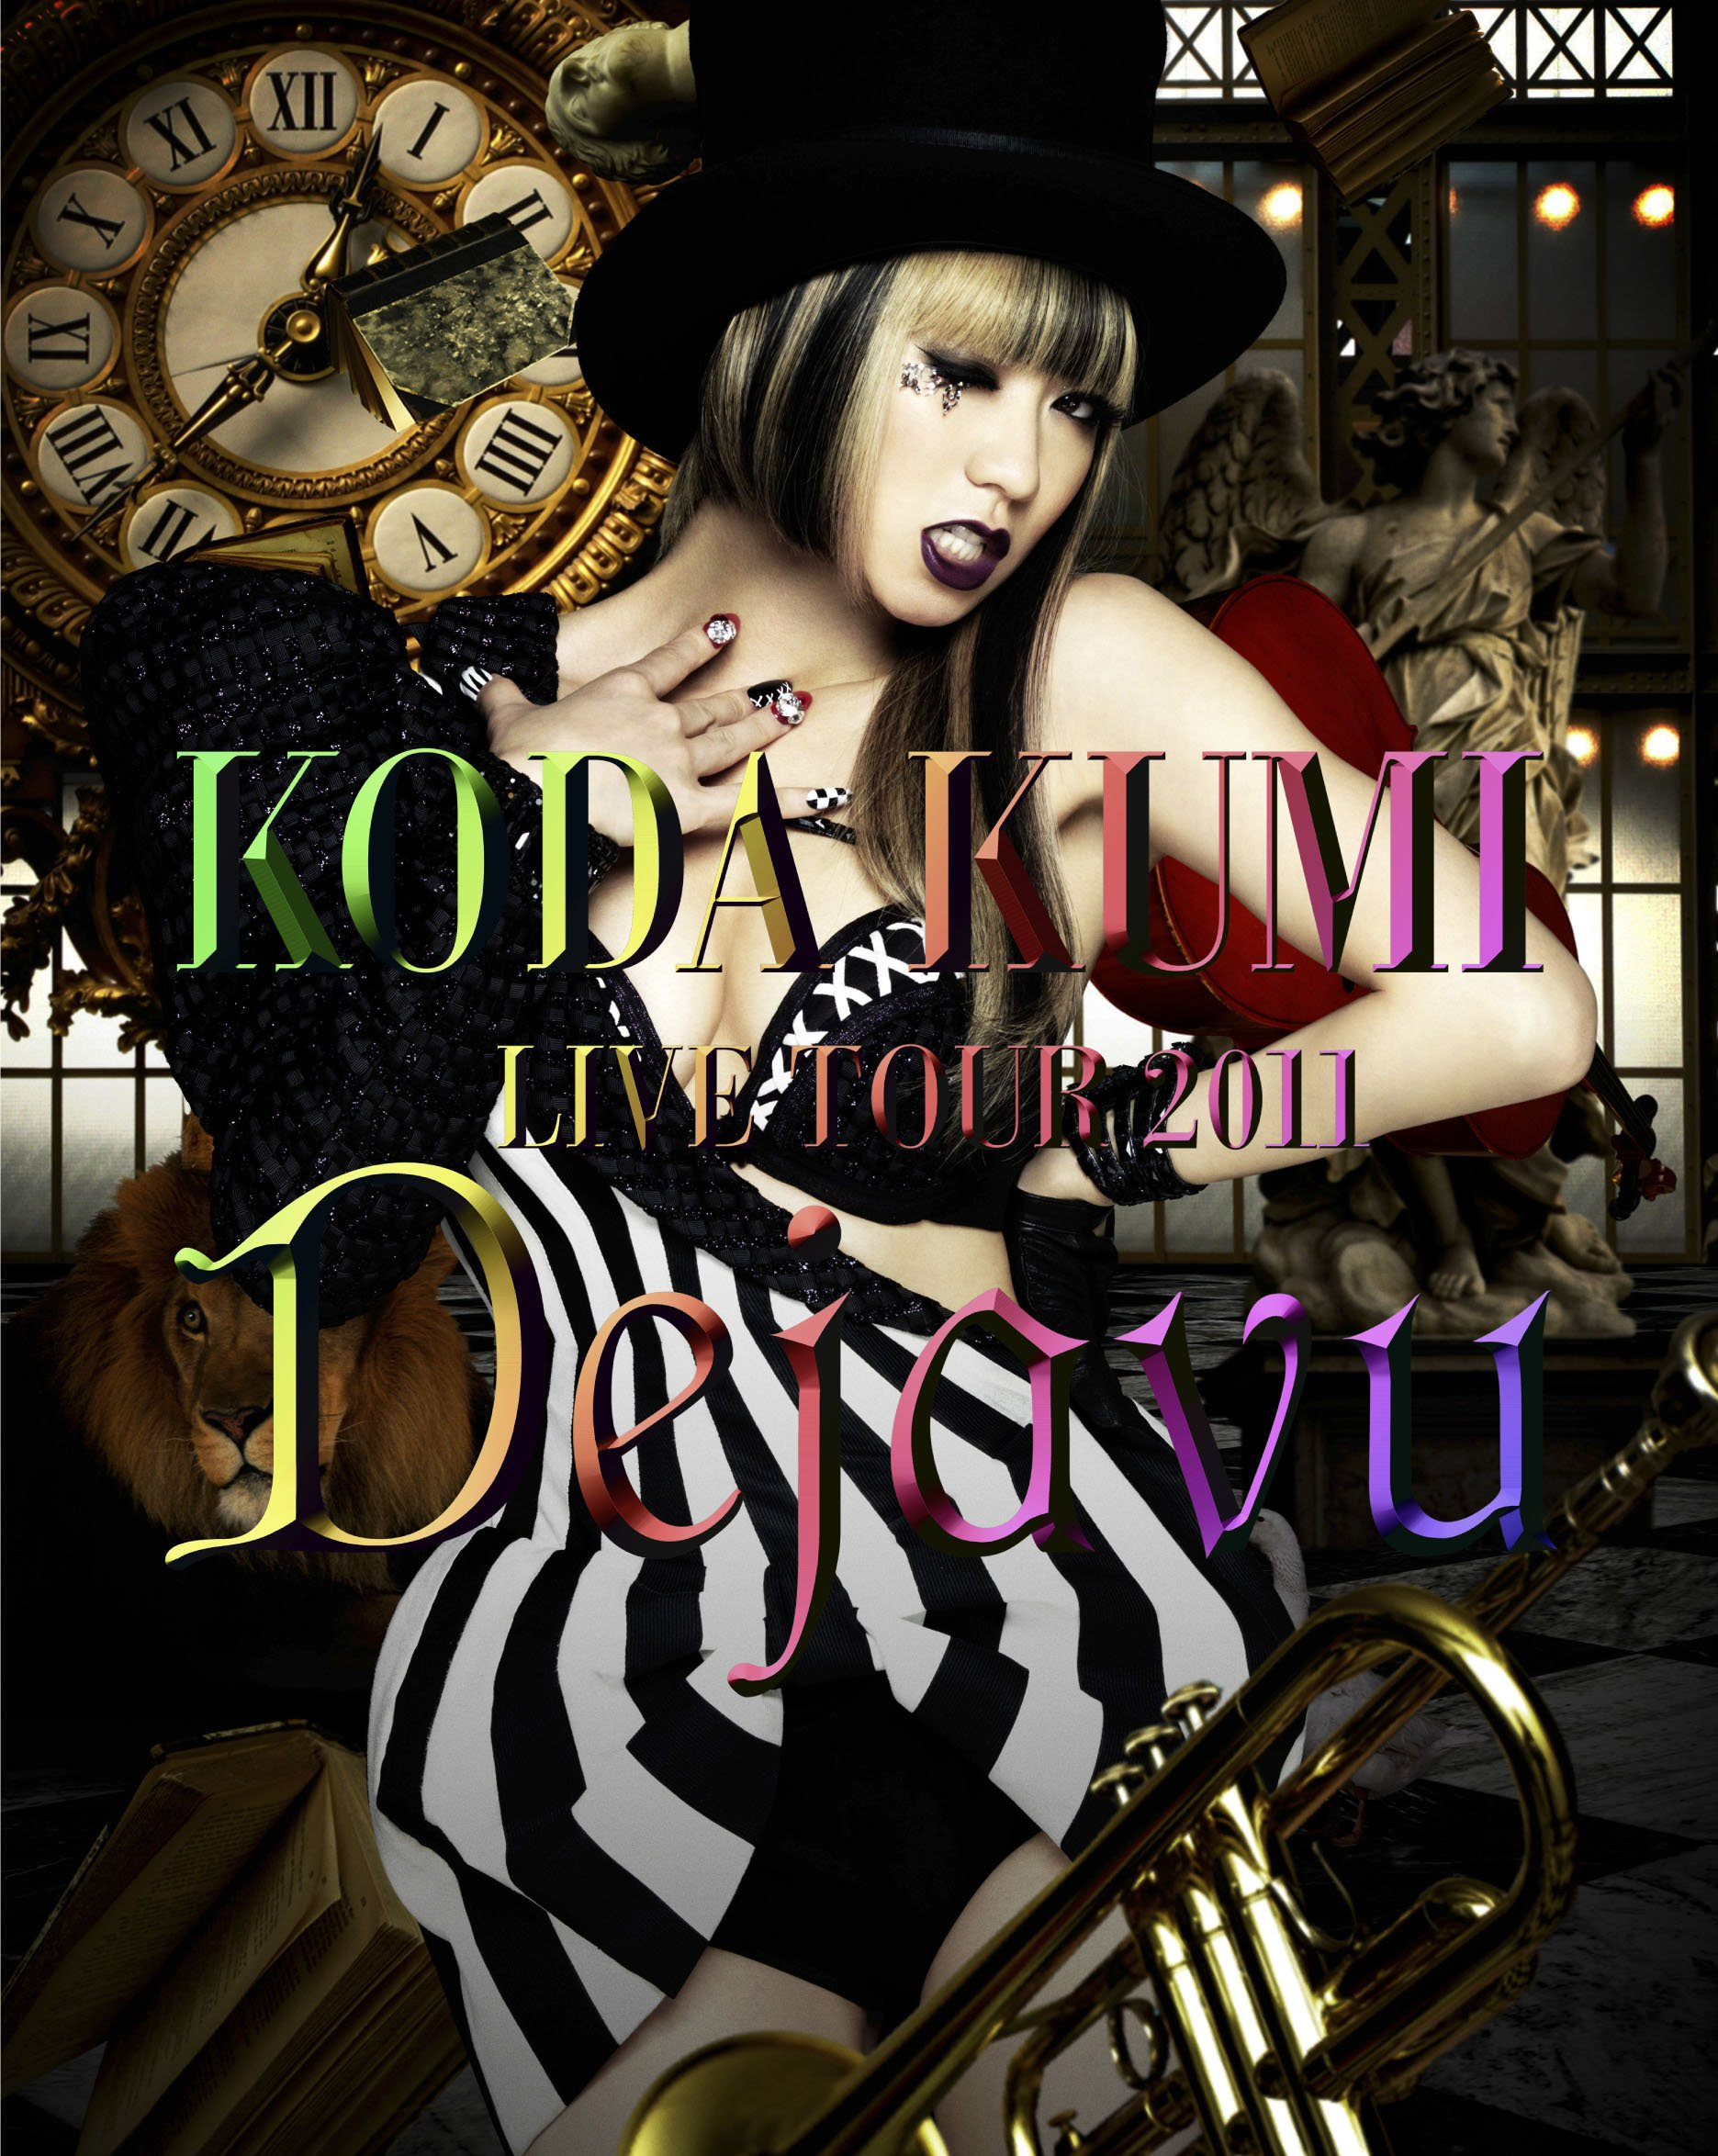 倖田來未 (Koda Kumi) – KODA KUMI LIVE TOUR 2011 ~Dejavu~ (2012) Blu-ray ISO + MKV 1080p